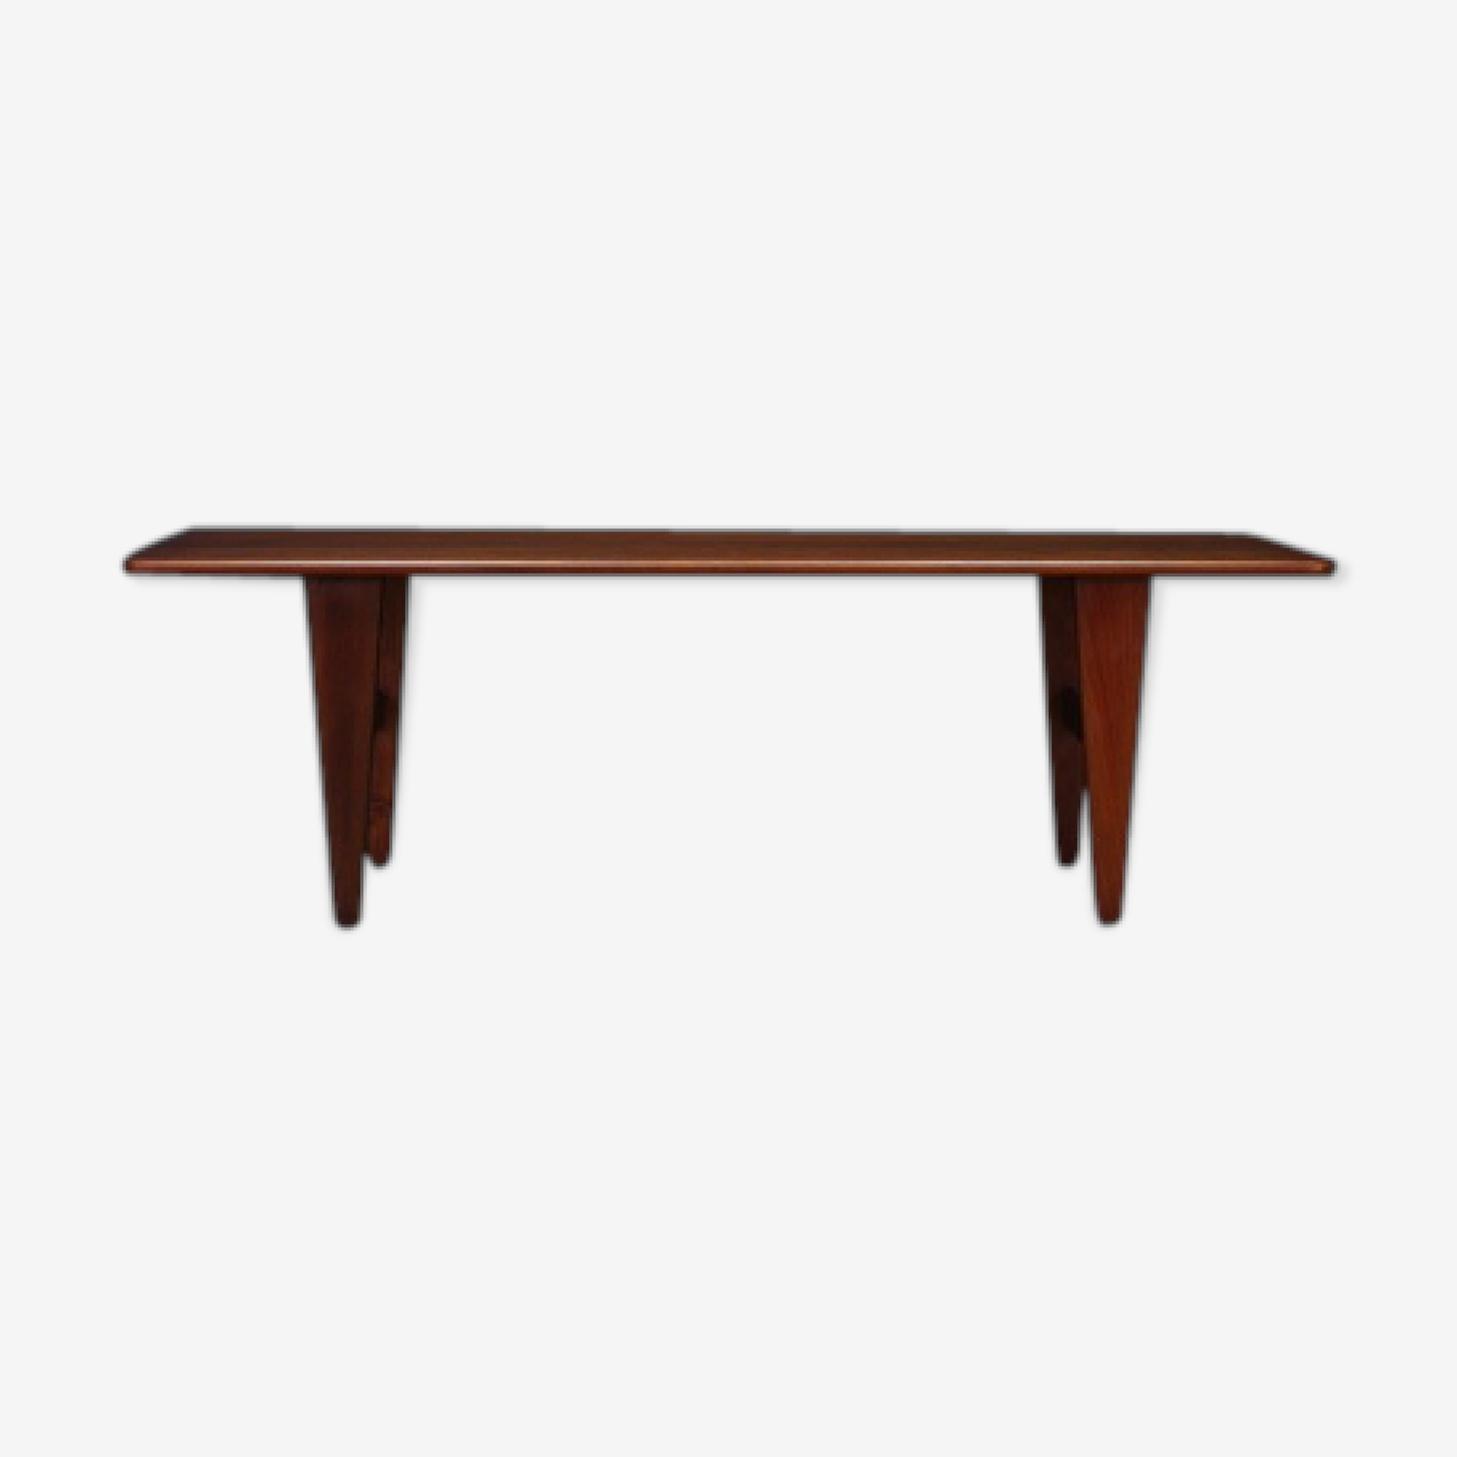 Table basse en teck, design danois